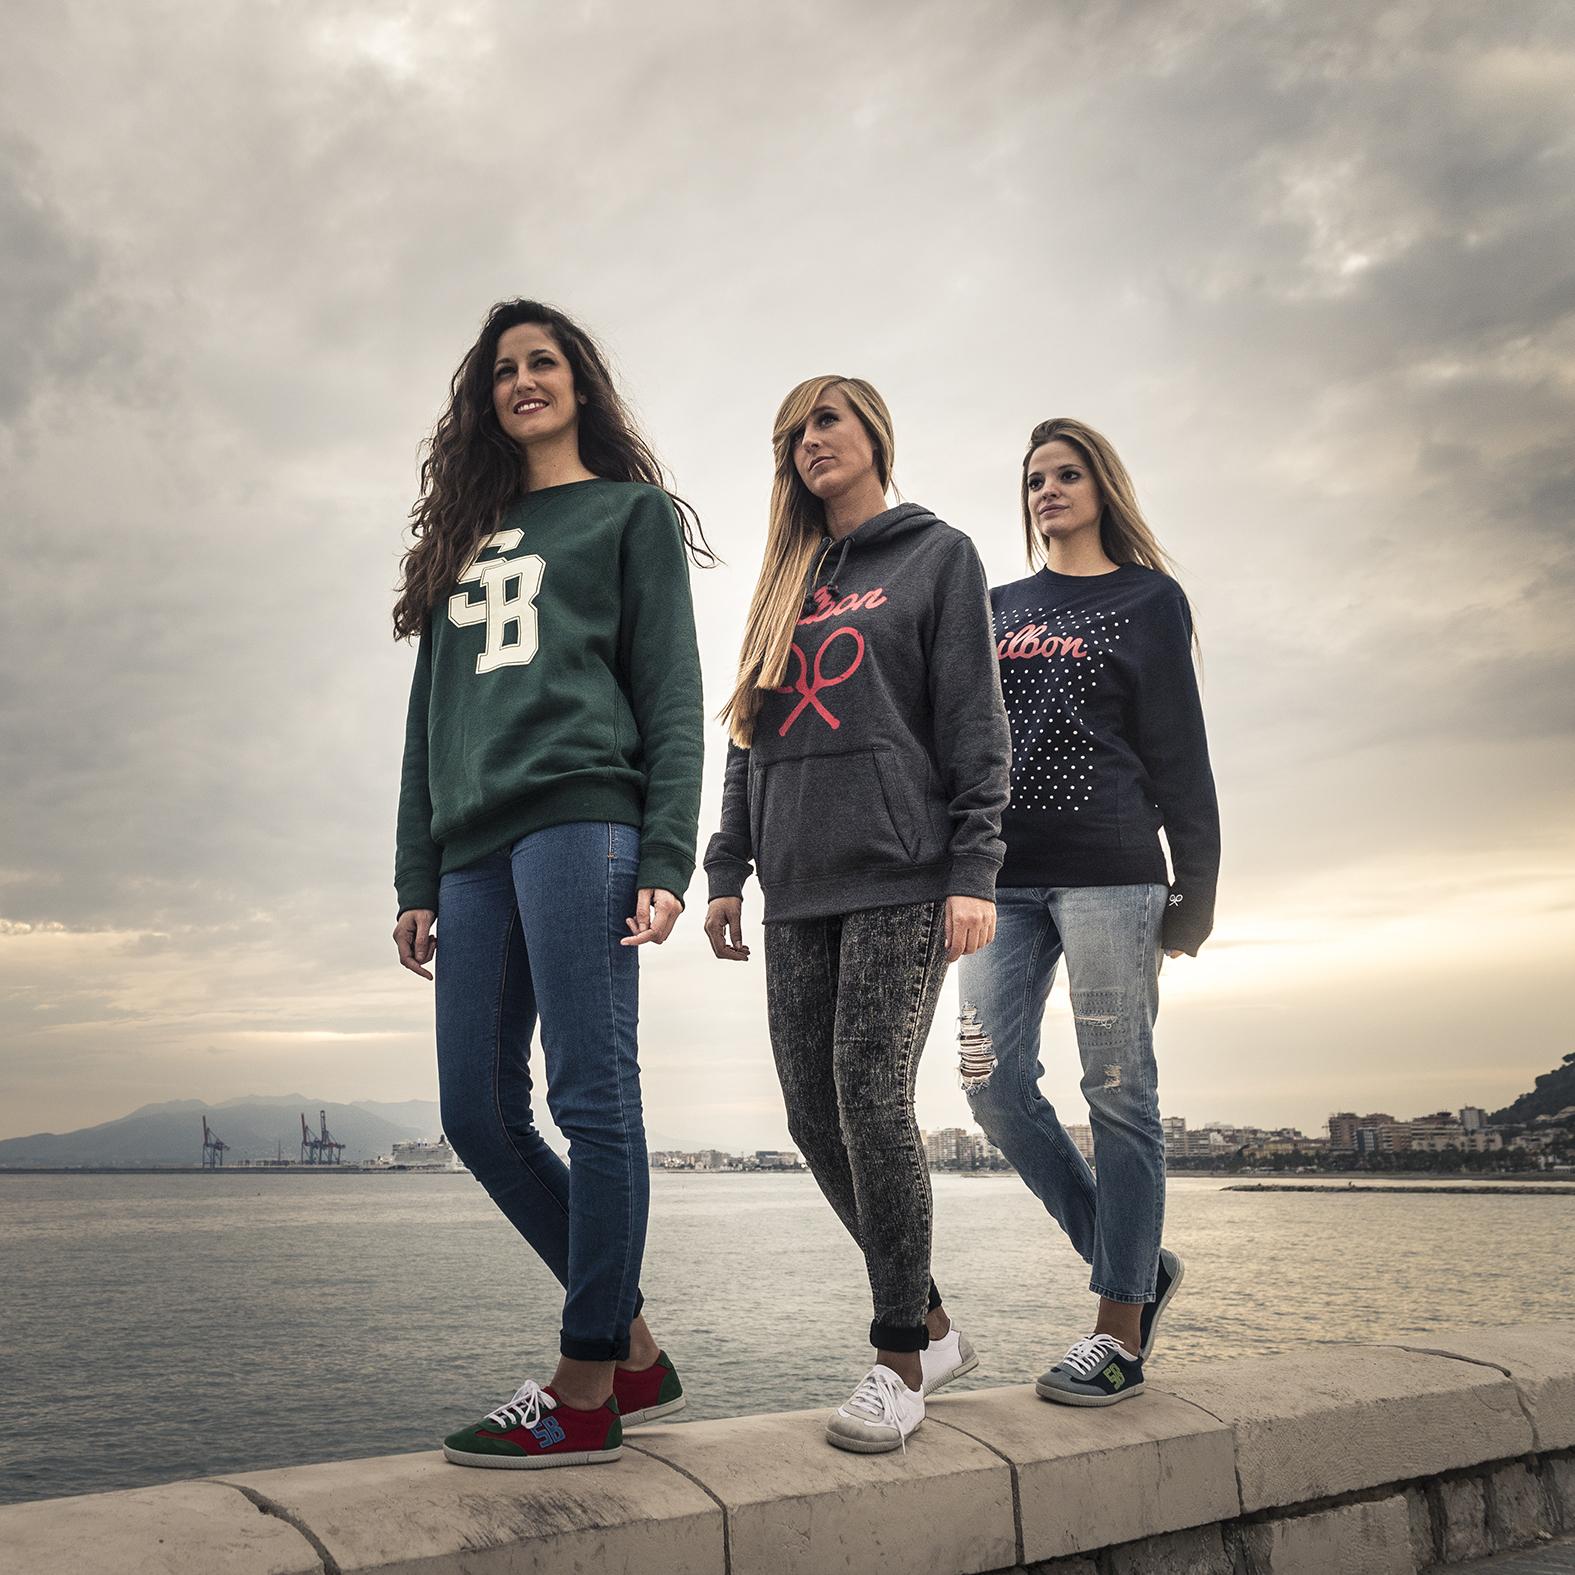 Men´s Style for Rebel Girls by Silbon